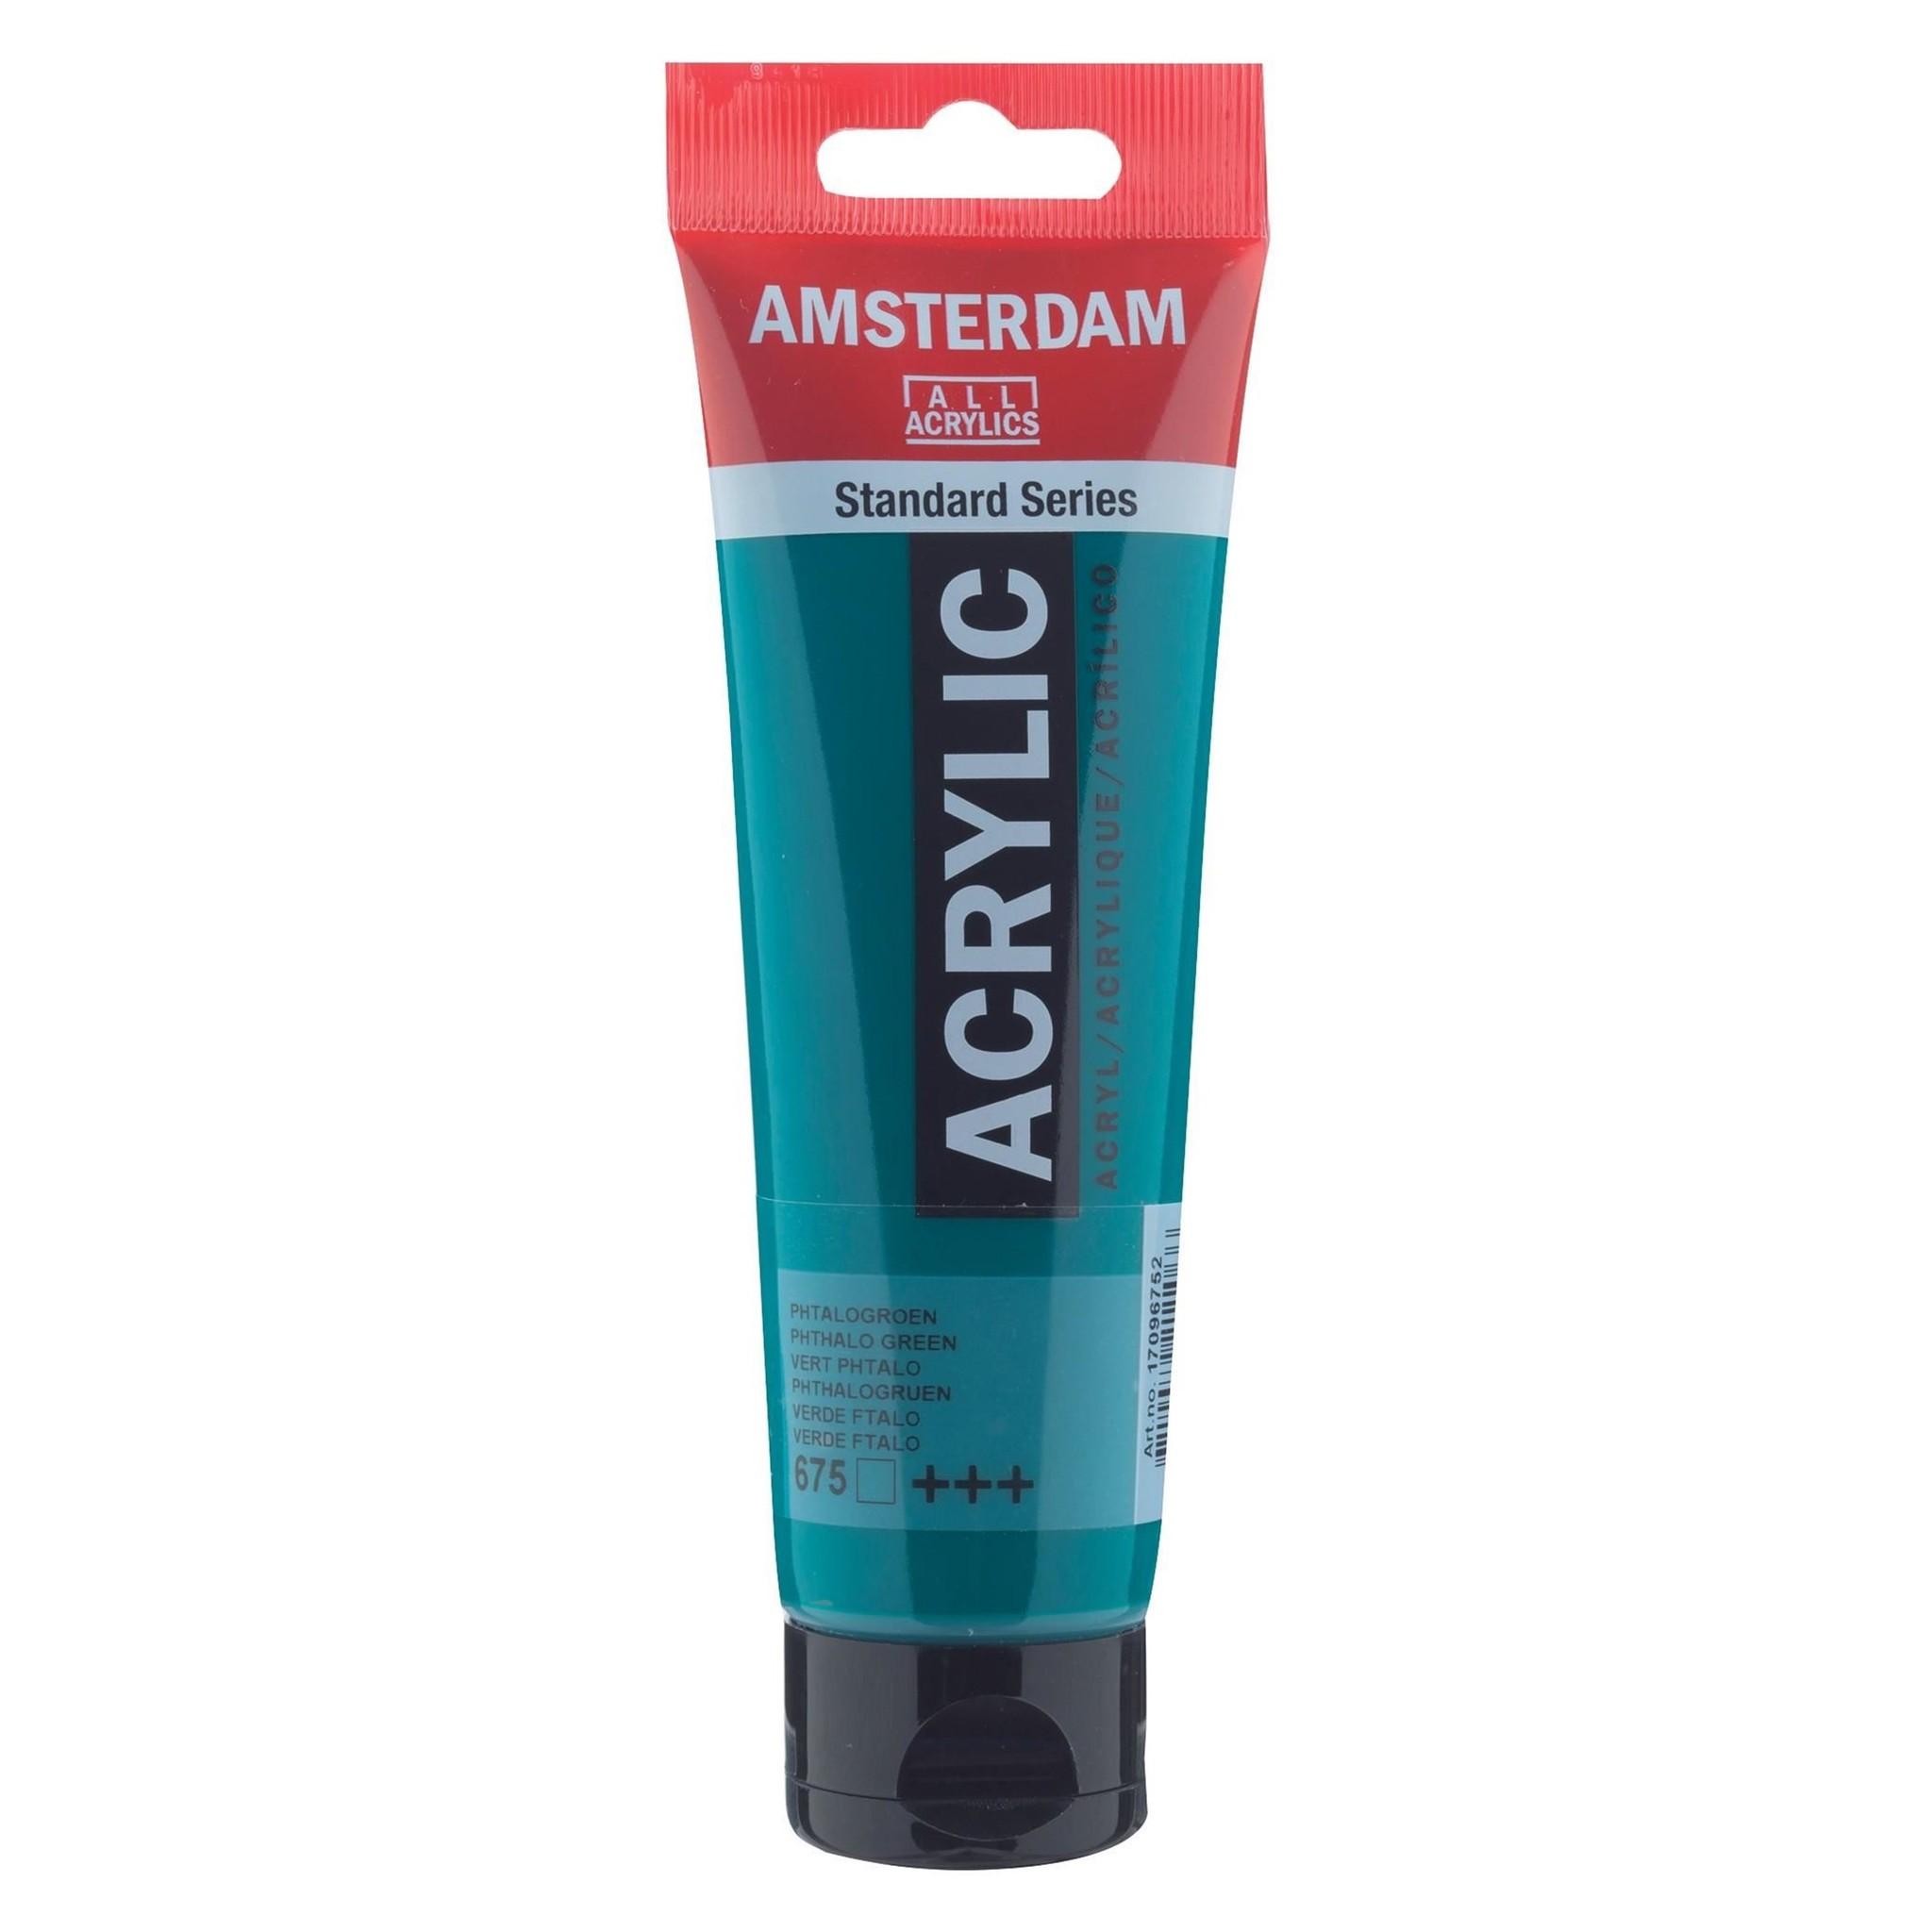 AMSTERDAM ACRYLIC 120ML PHTHALO GREEN